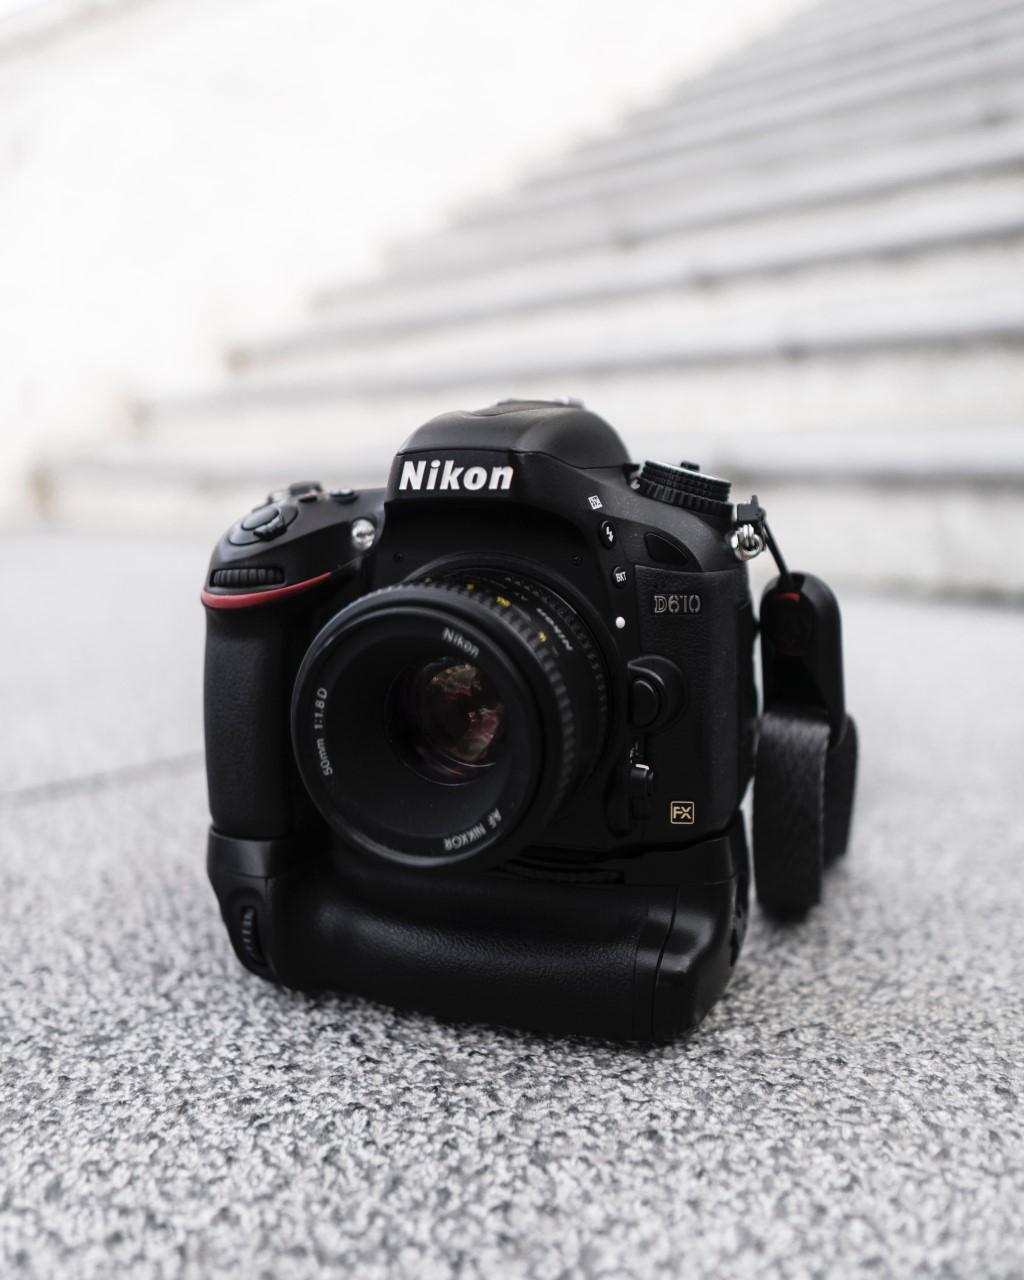 Nikon D610 Review image